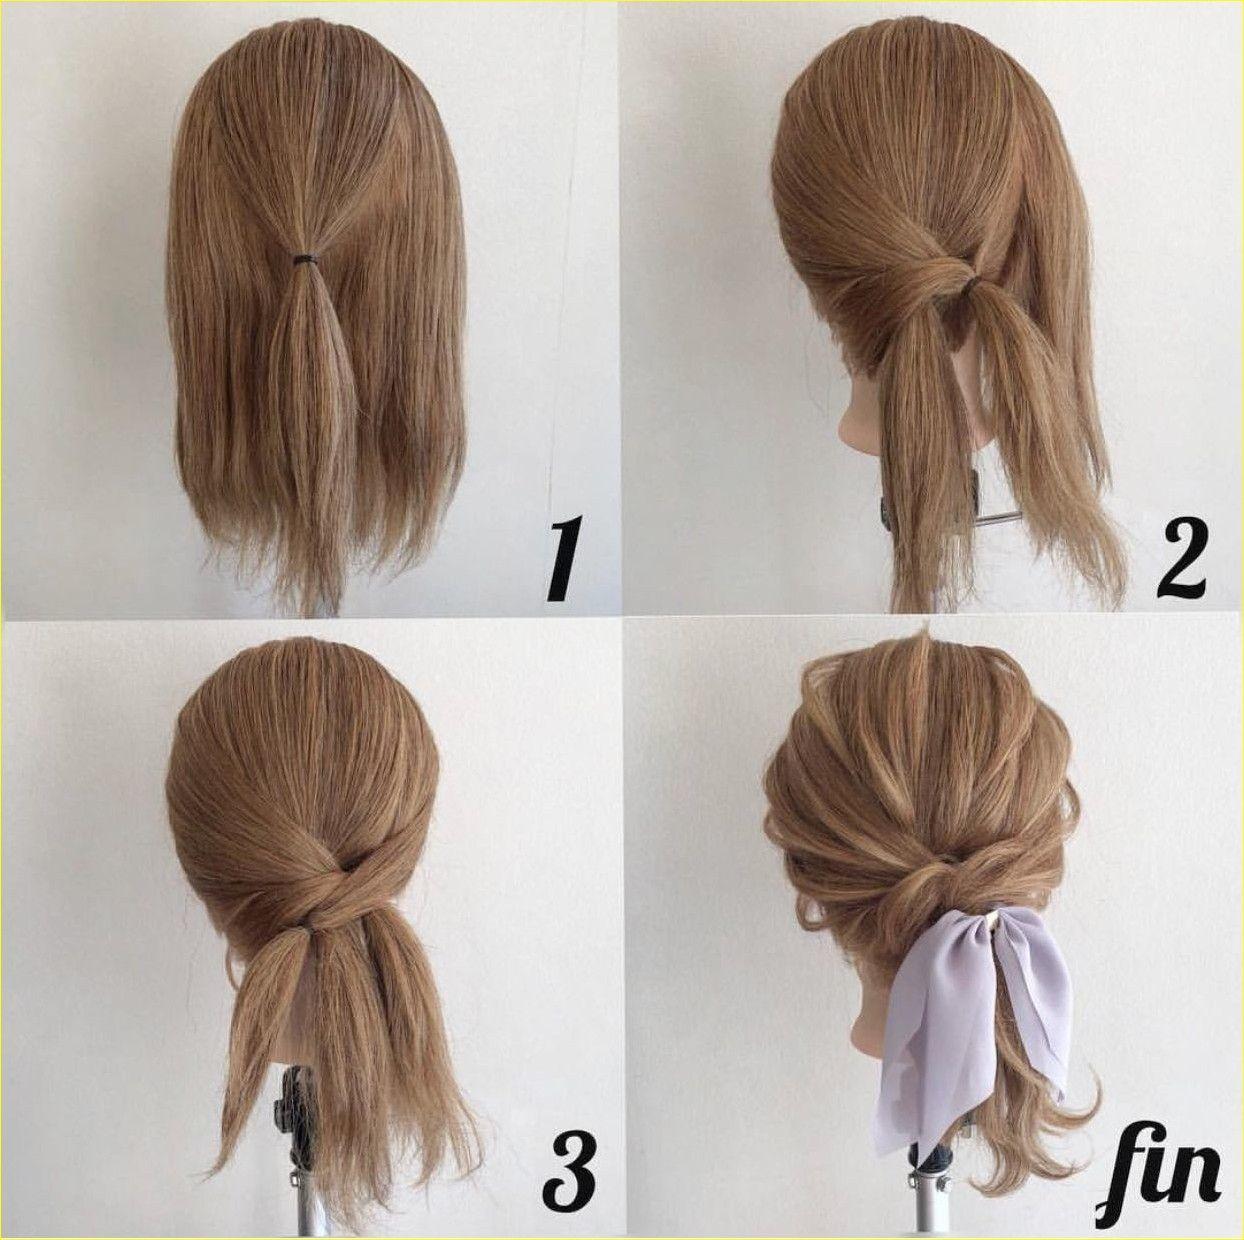 Haaranordnung Frisur Trend Hair Styles Hair Arrange Short Hair Styles